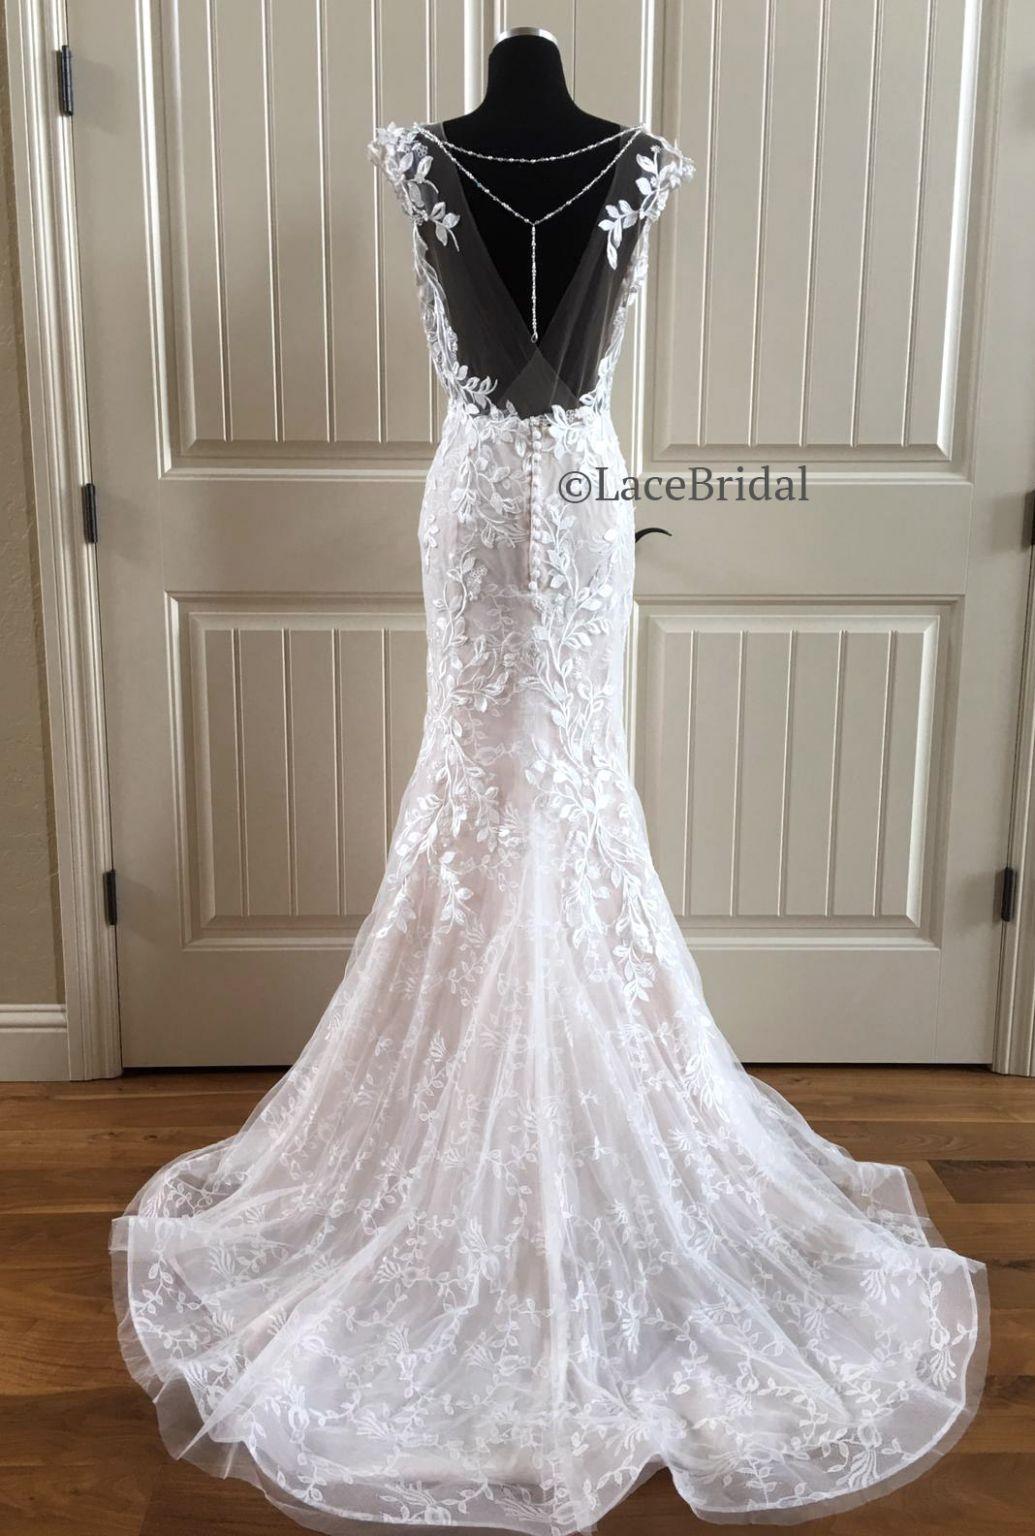 Naviblue Beatrice 18309 14 in 2020 Wedding dresses